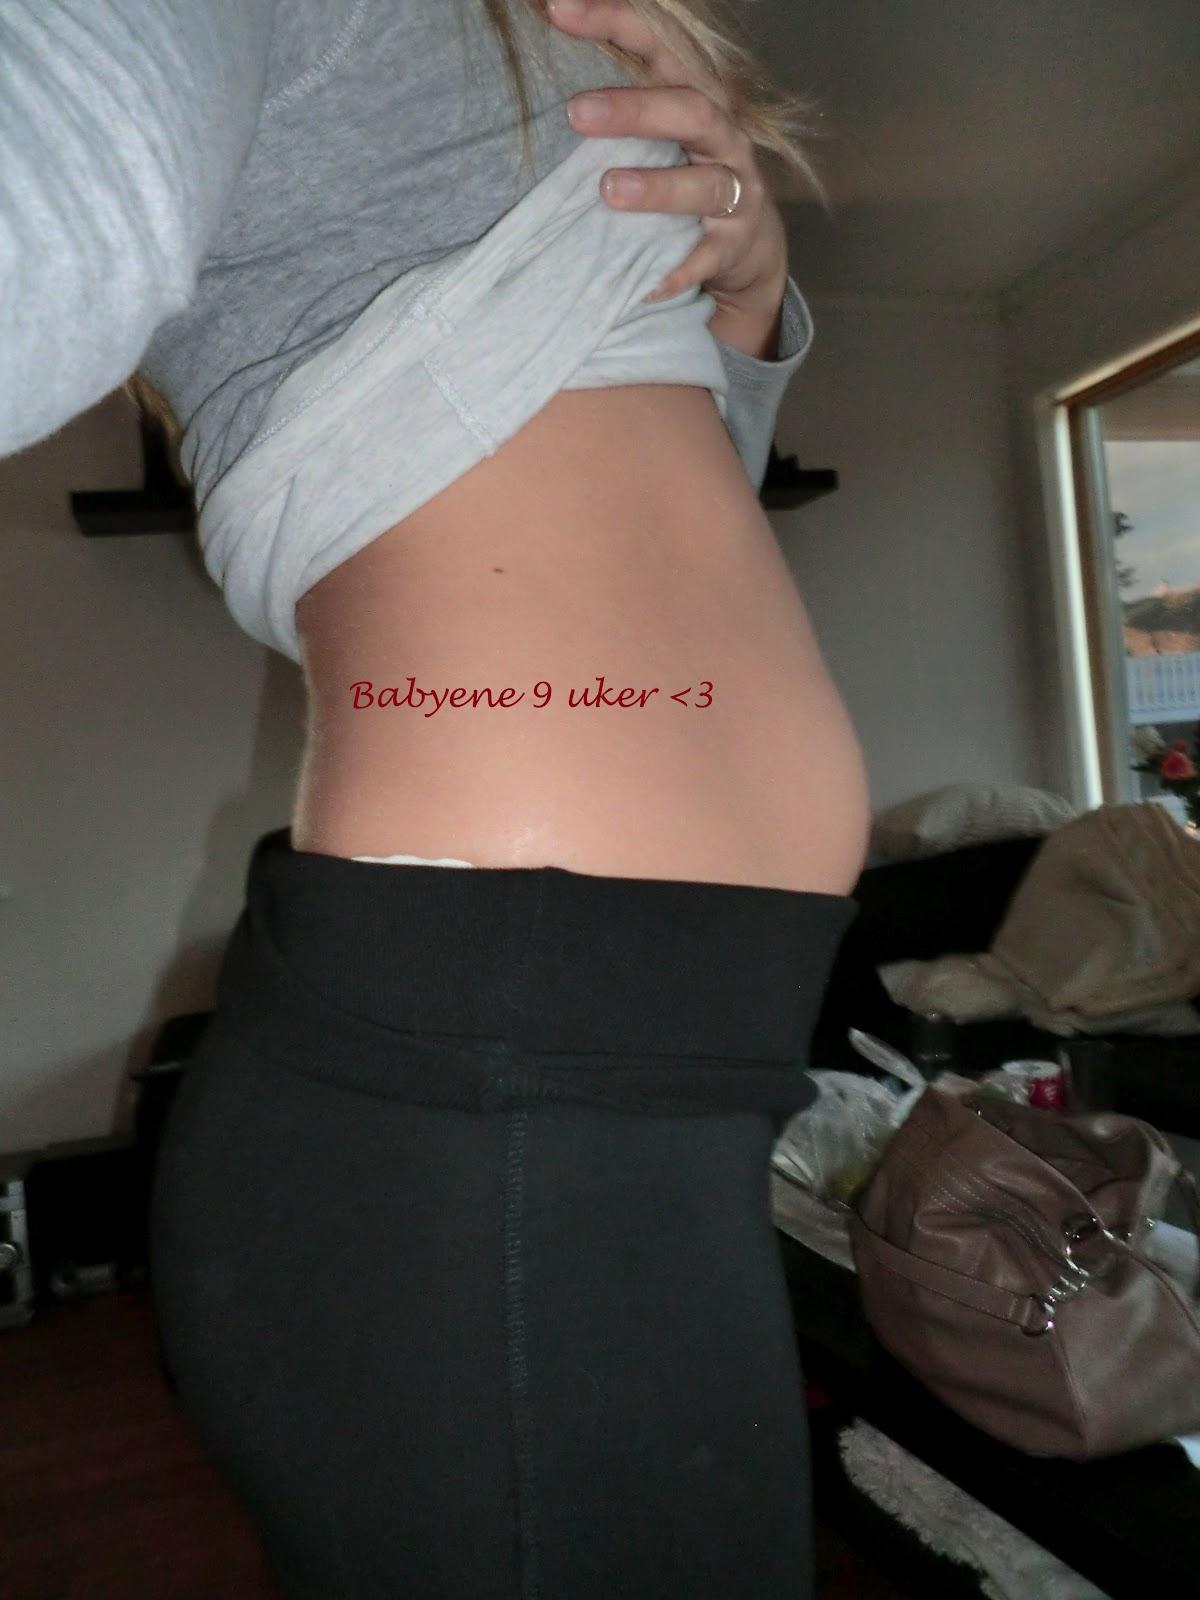 vondt øverst i magen livmorhals gravid